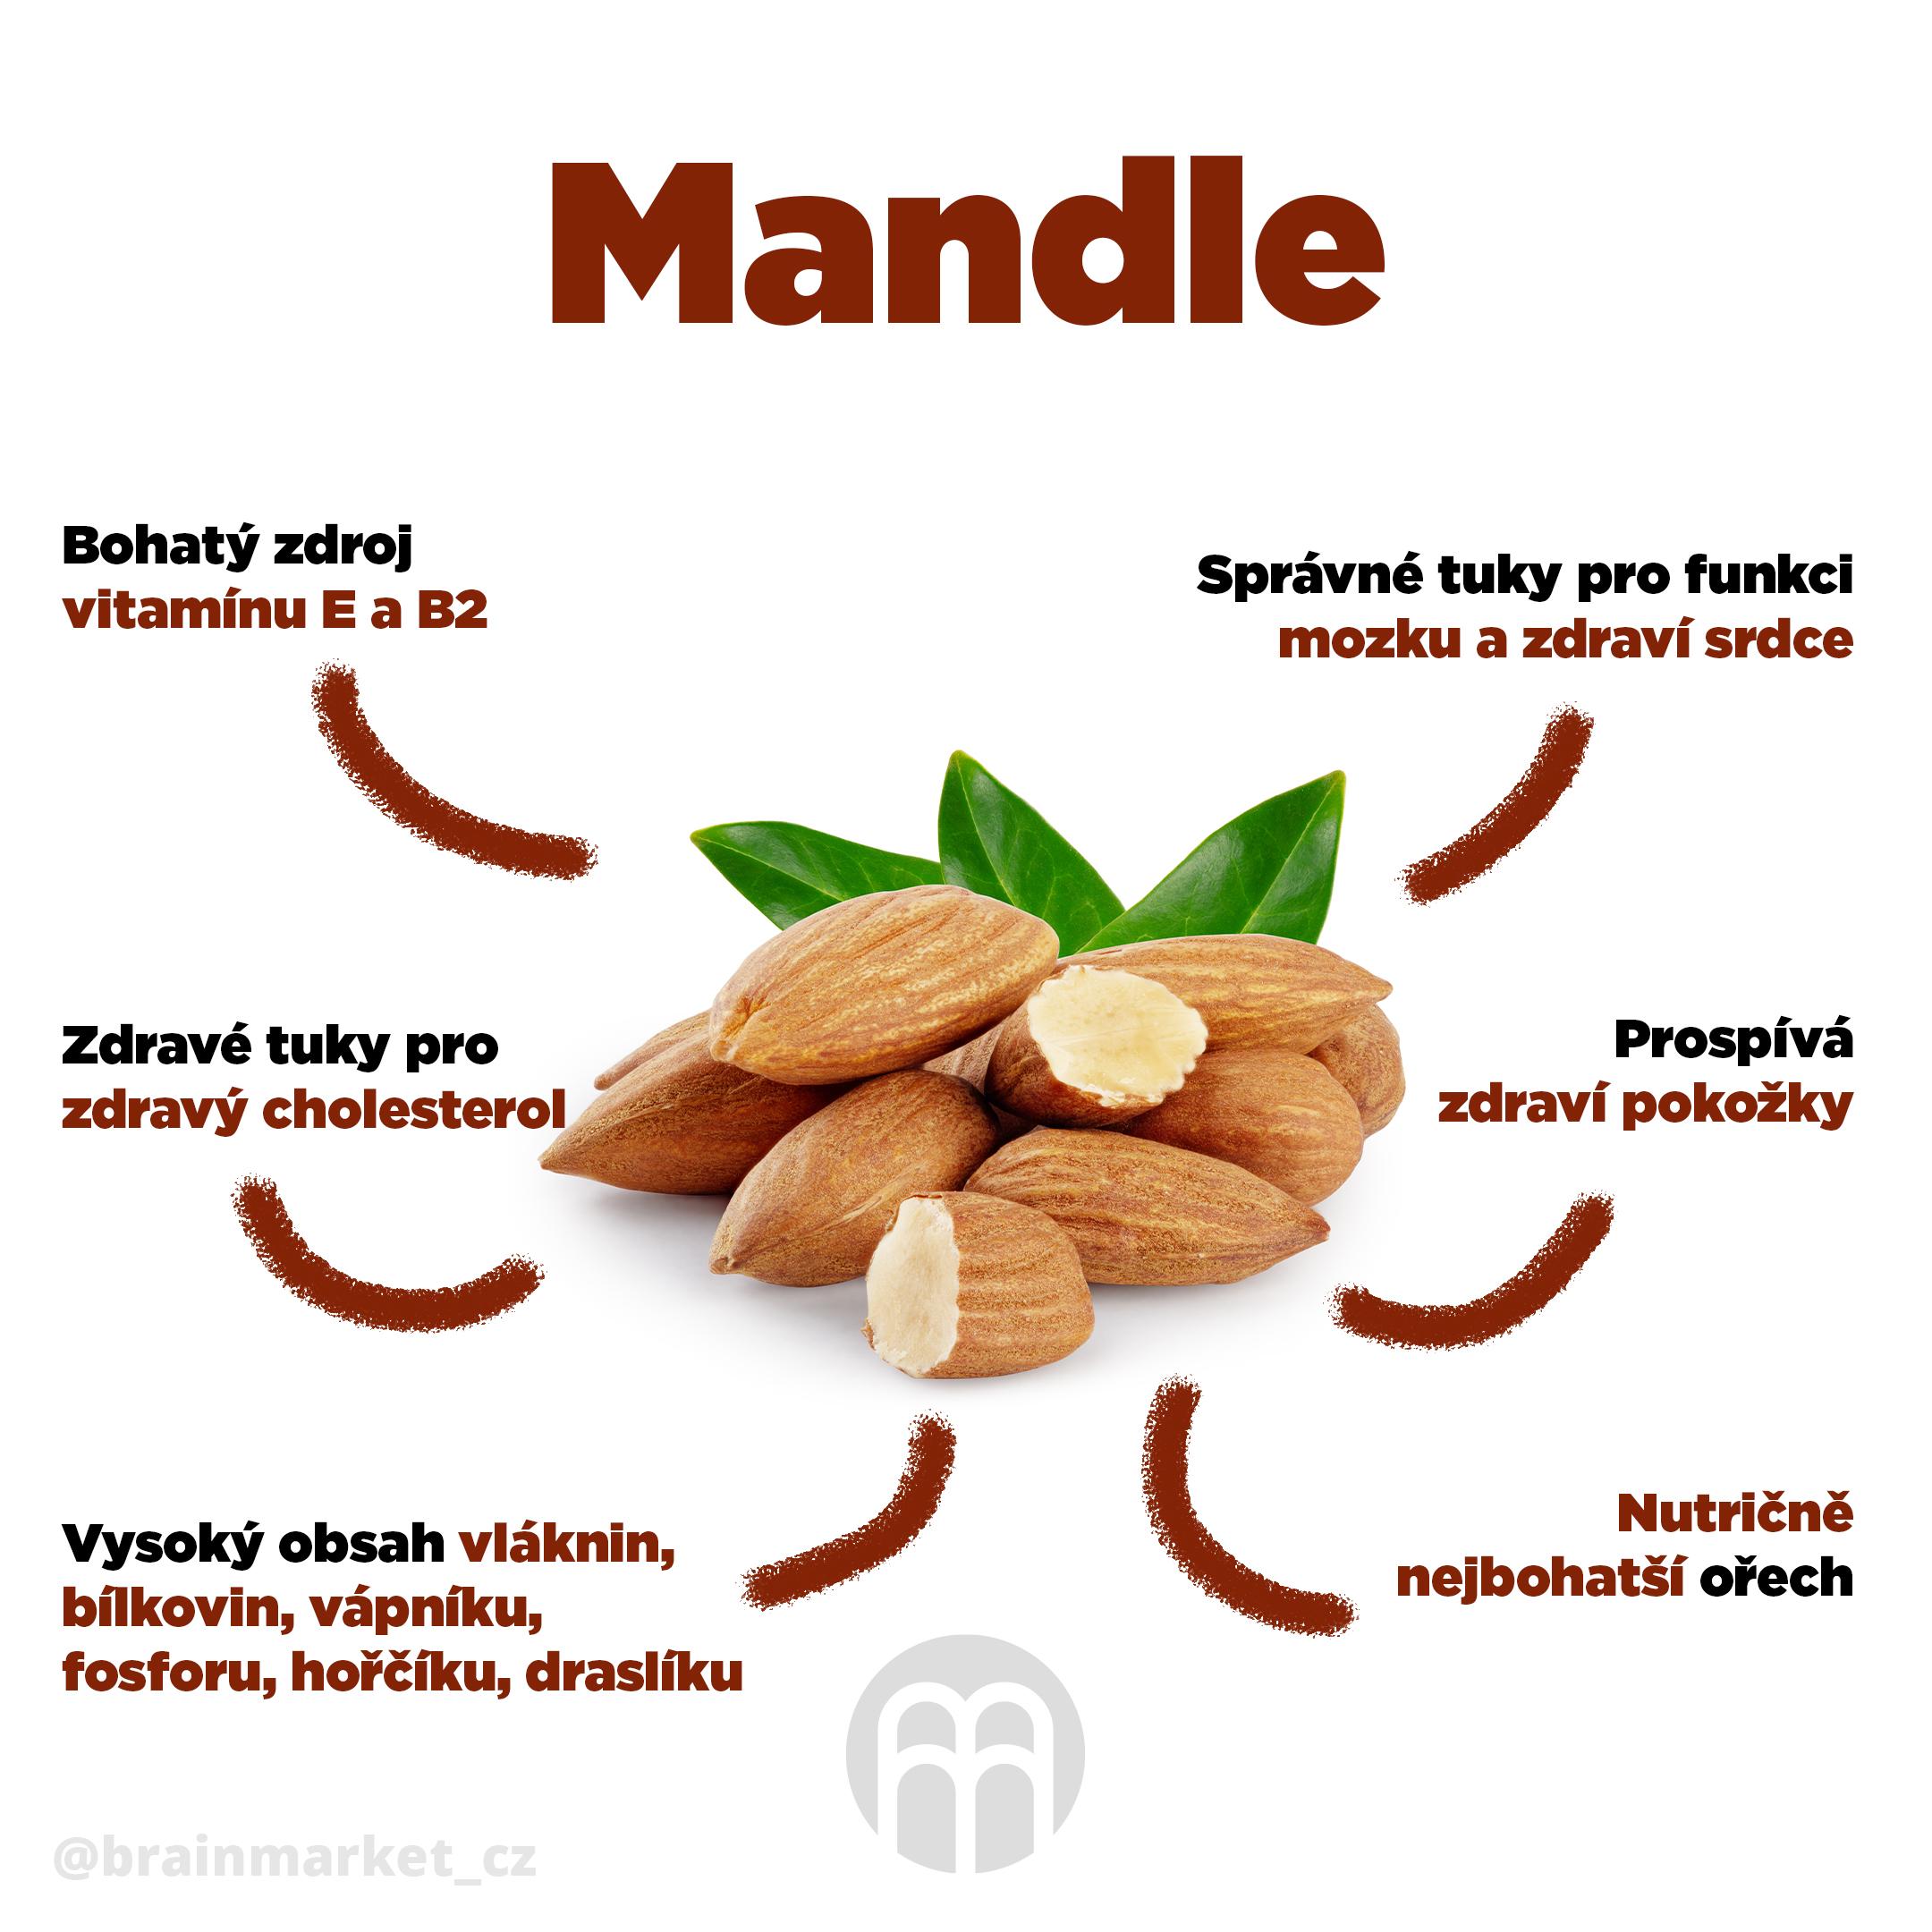 mandle-infografika-brainmarket-cz